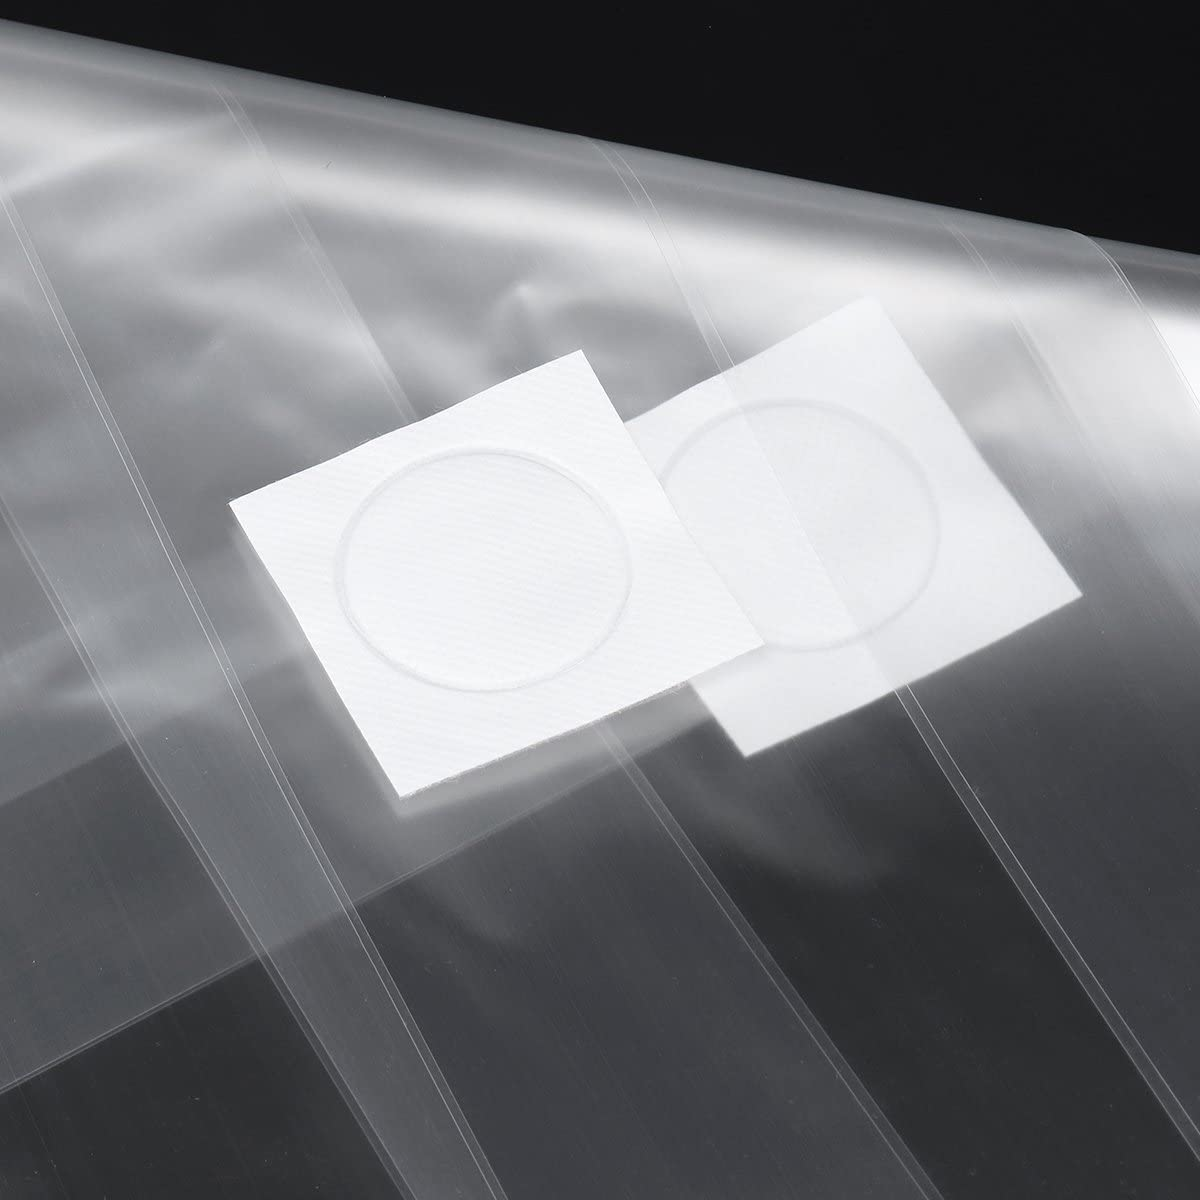 CHIMAKA 50Pcs 200x450x0.06mm PVC Mushroom Grow Seedling Bags Substrate Alta temperatura Pre sellable Nuevos accesorios de bricolaje